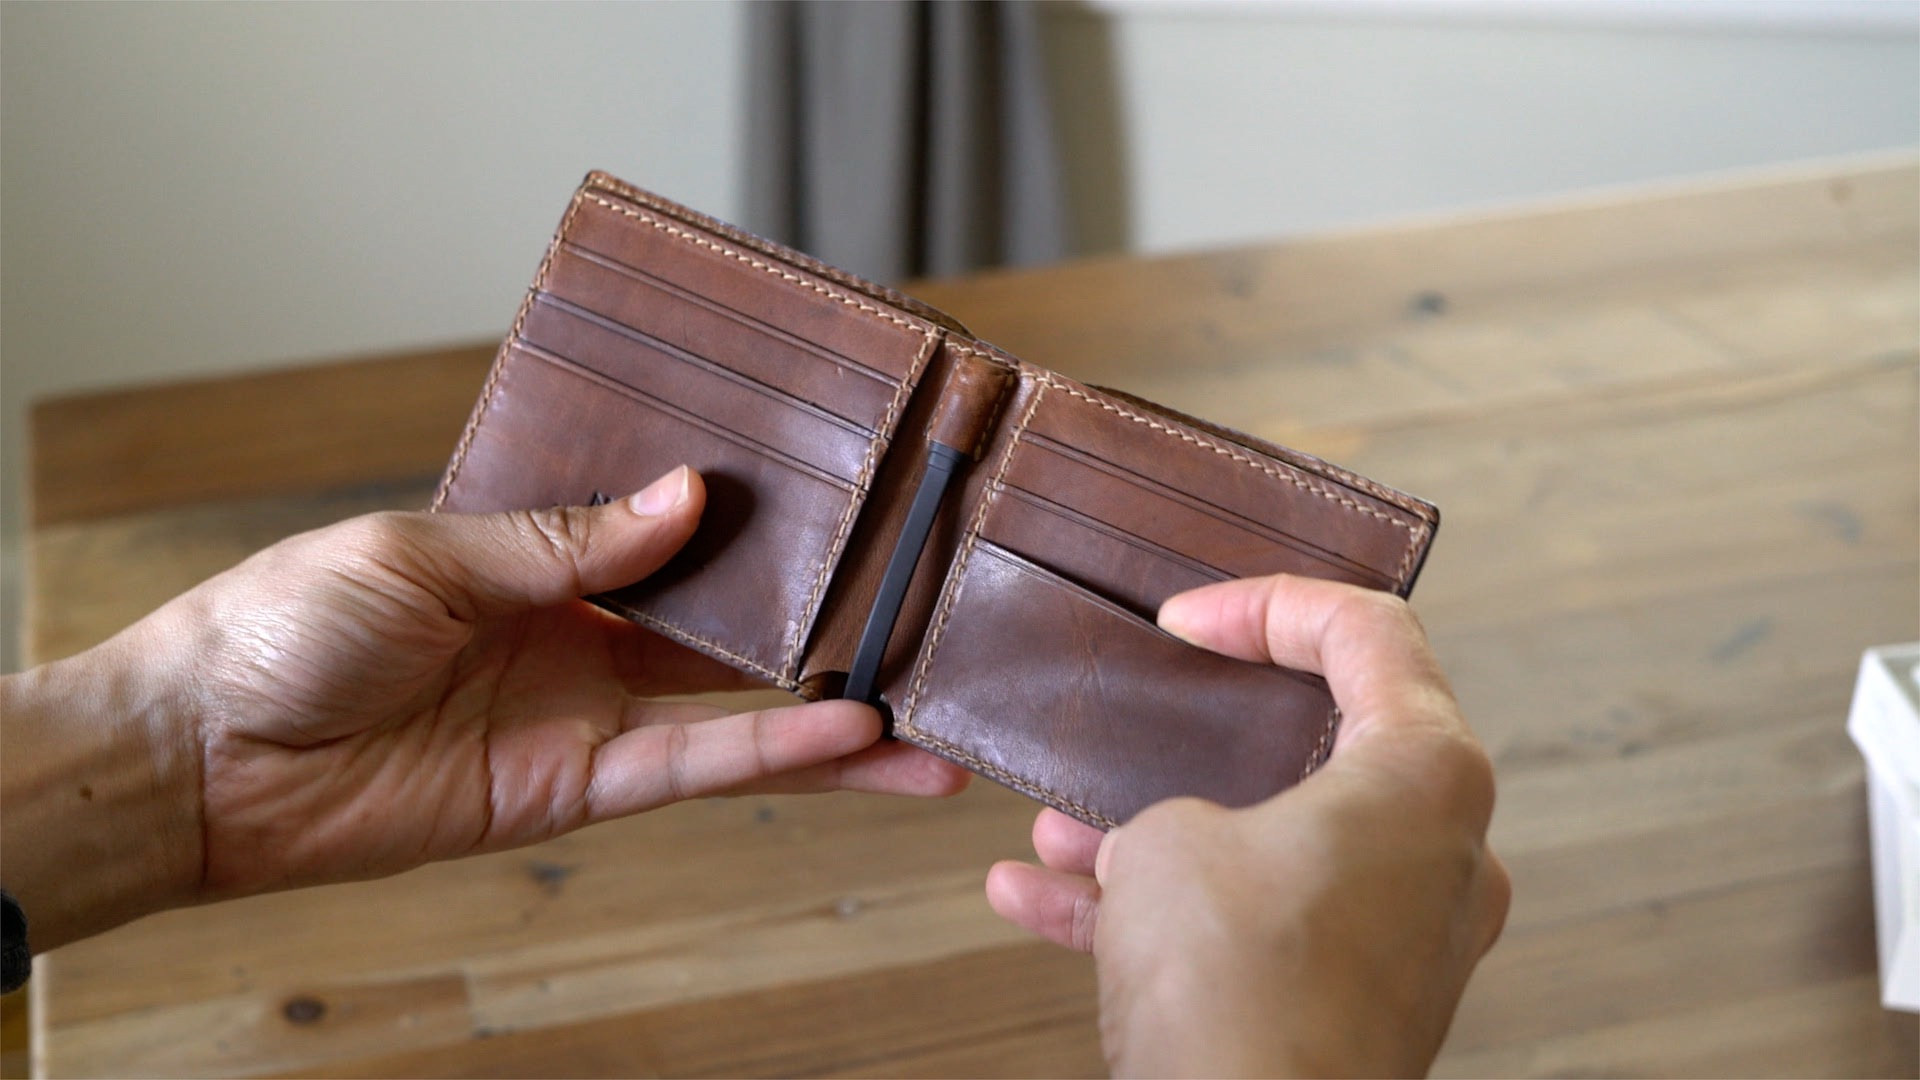 nomad-leather-wallet-integrated-battery-mfi-lightning-hands-on-07